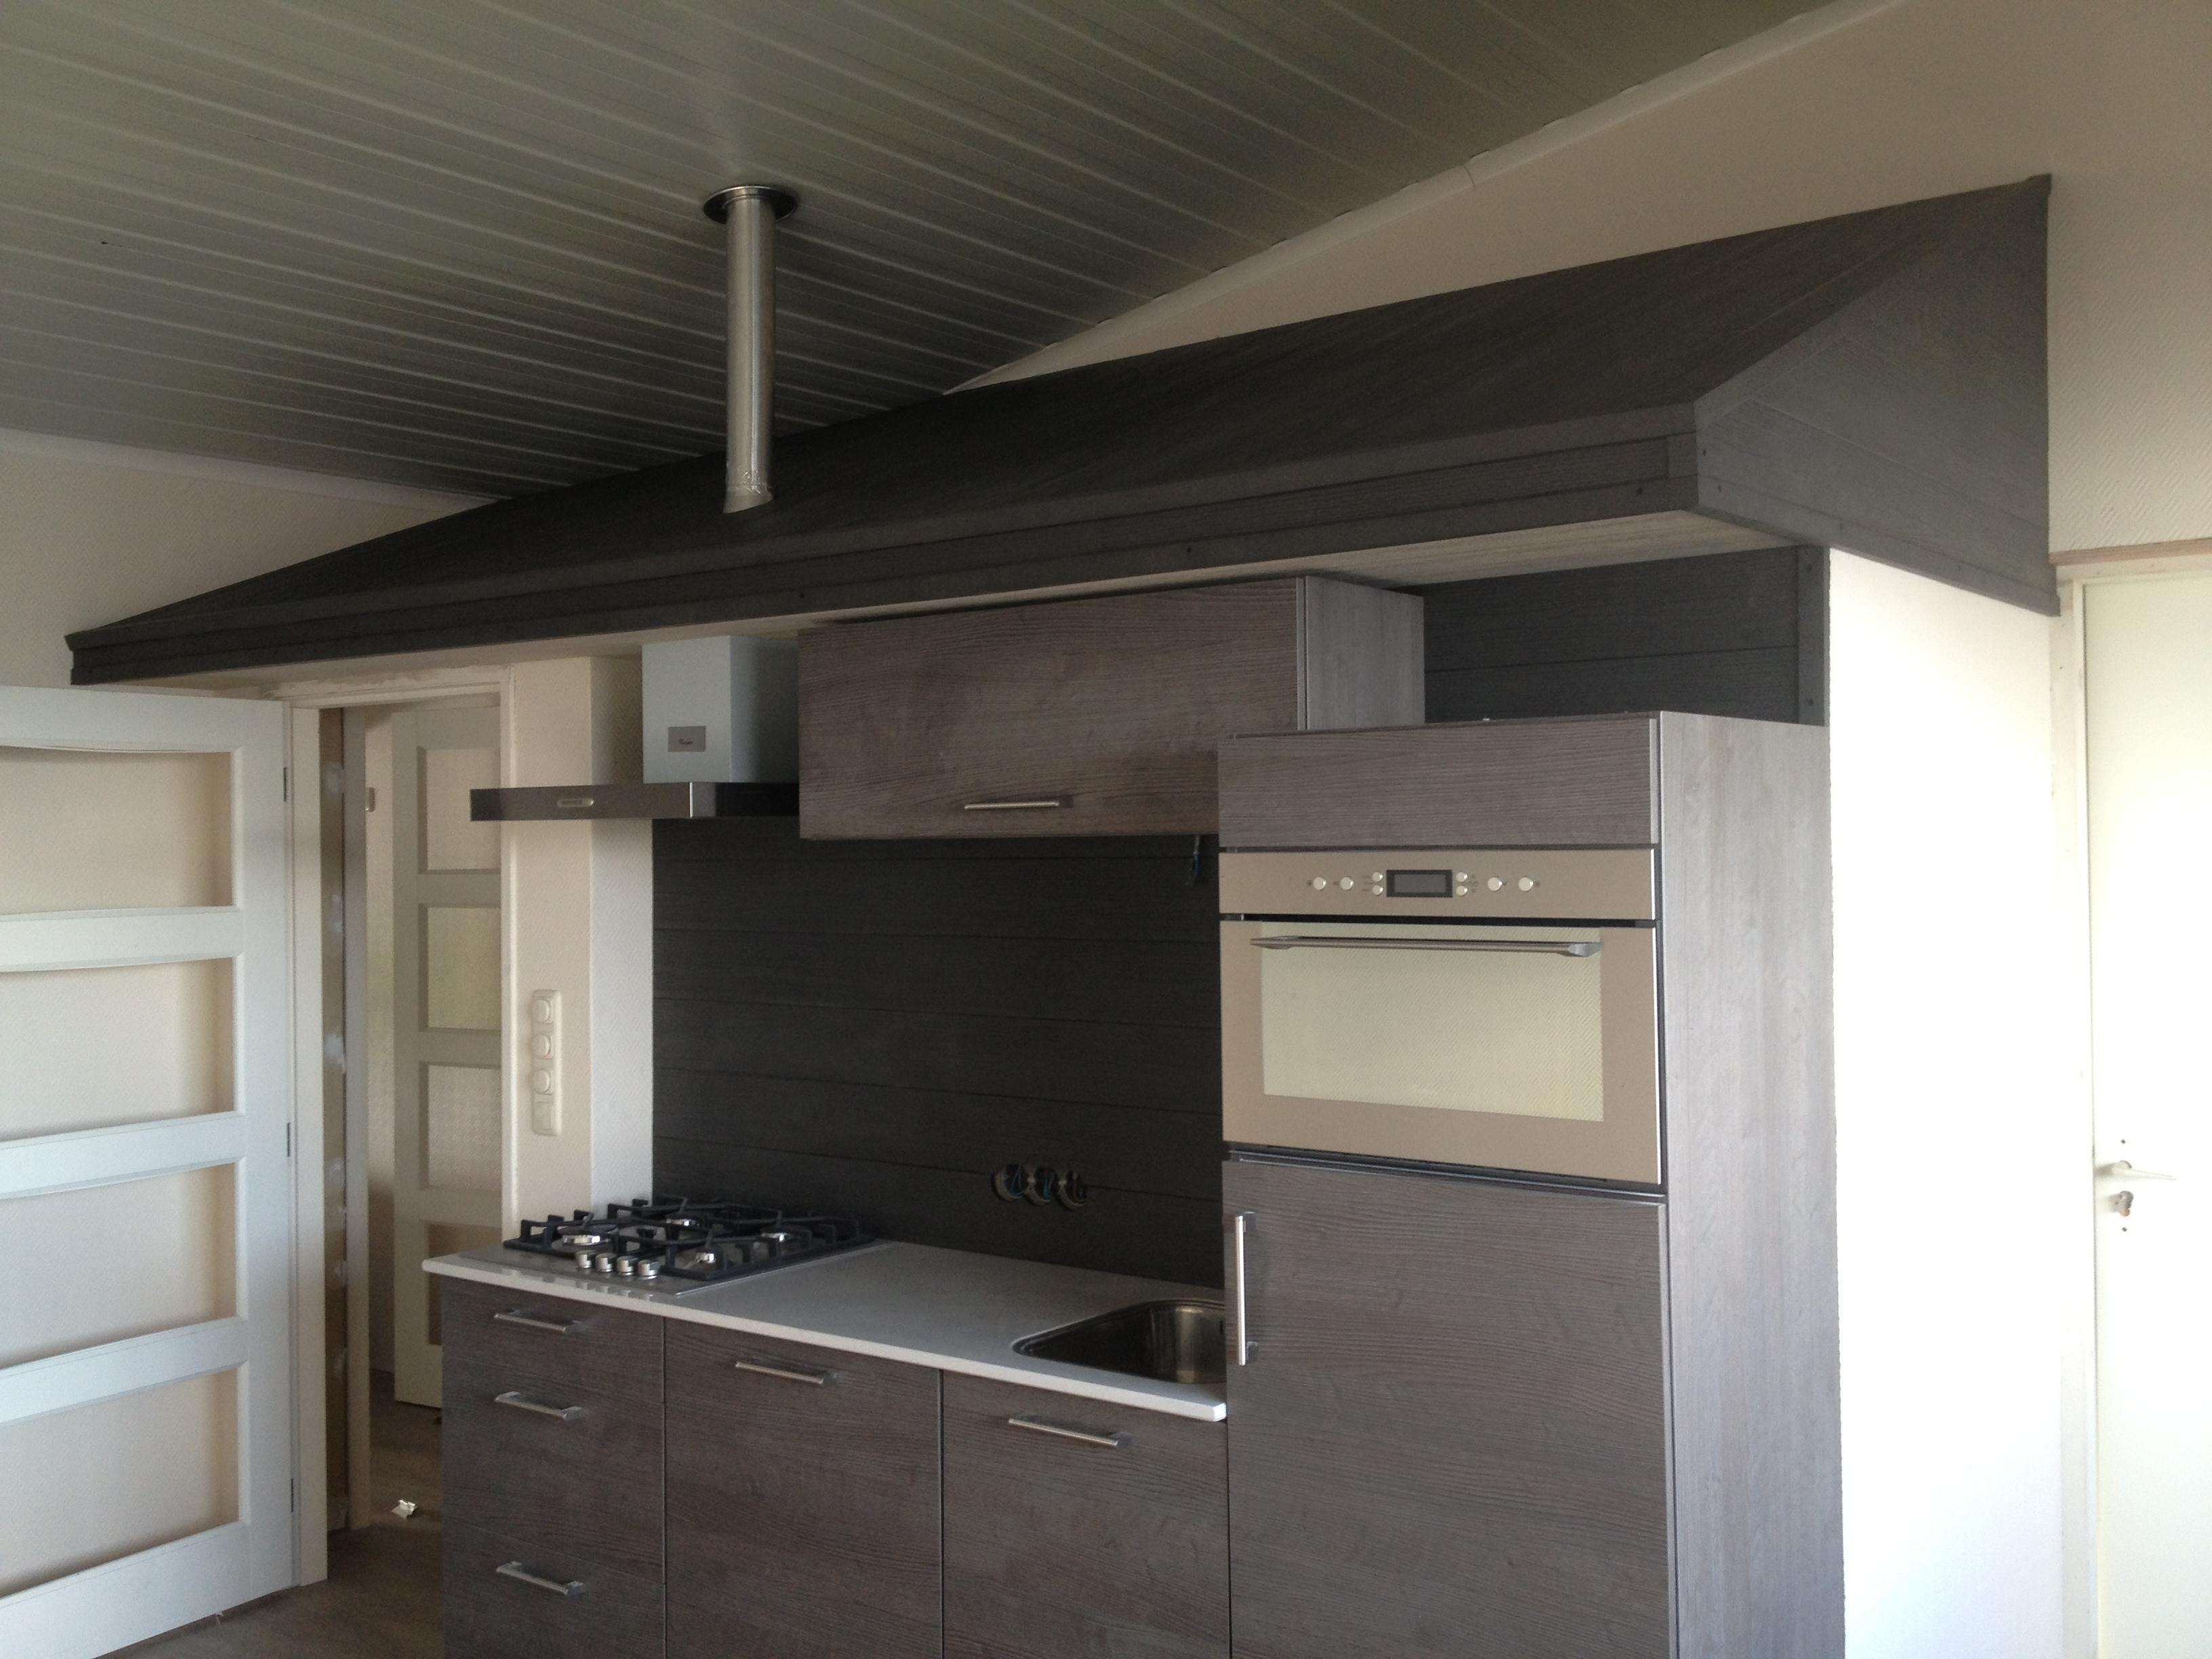 Keuken met Bacodeck wandbekleding